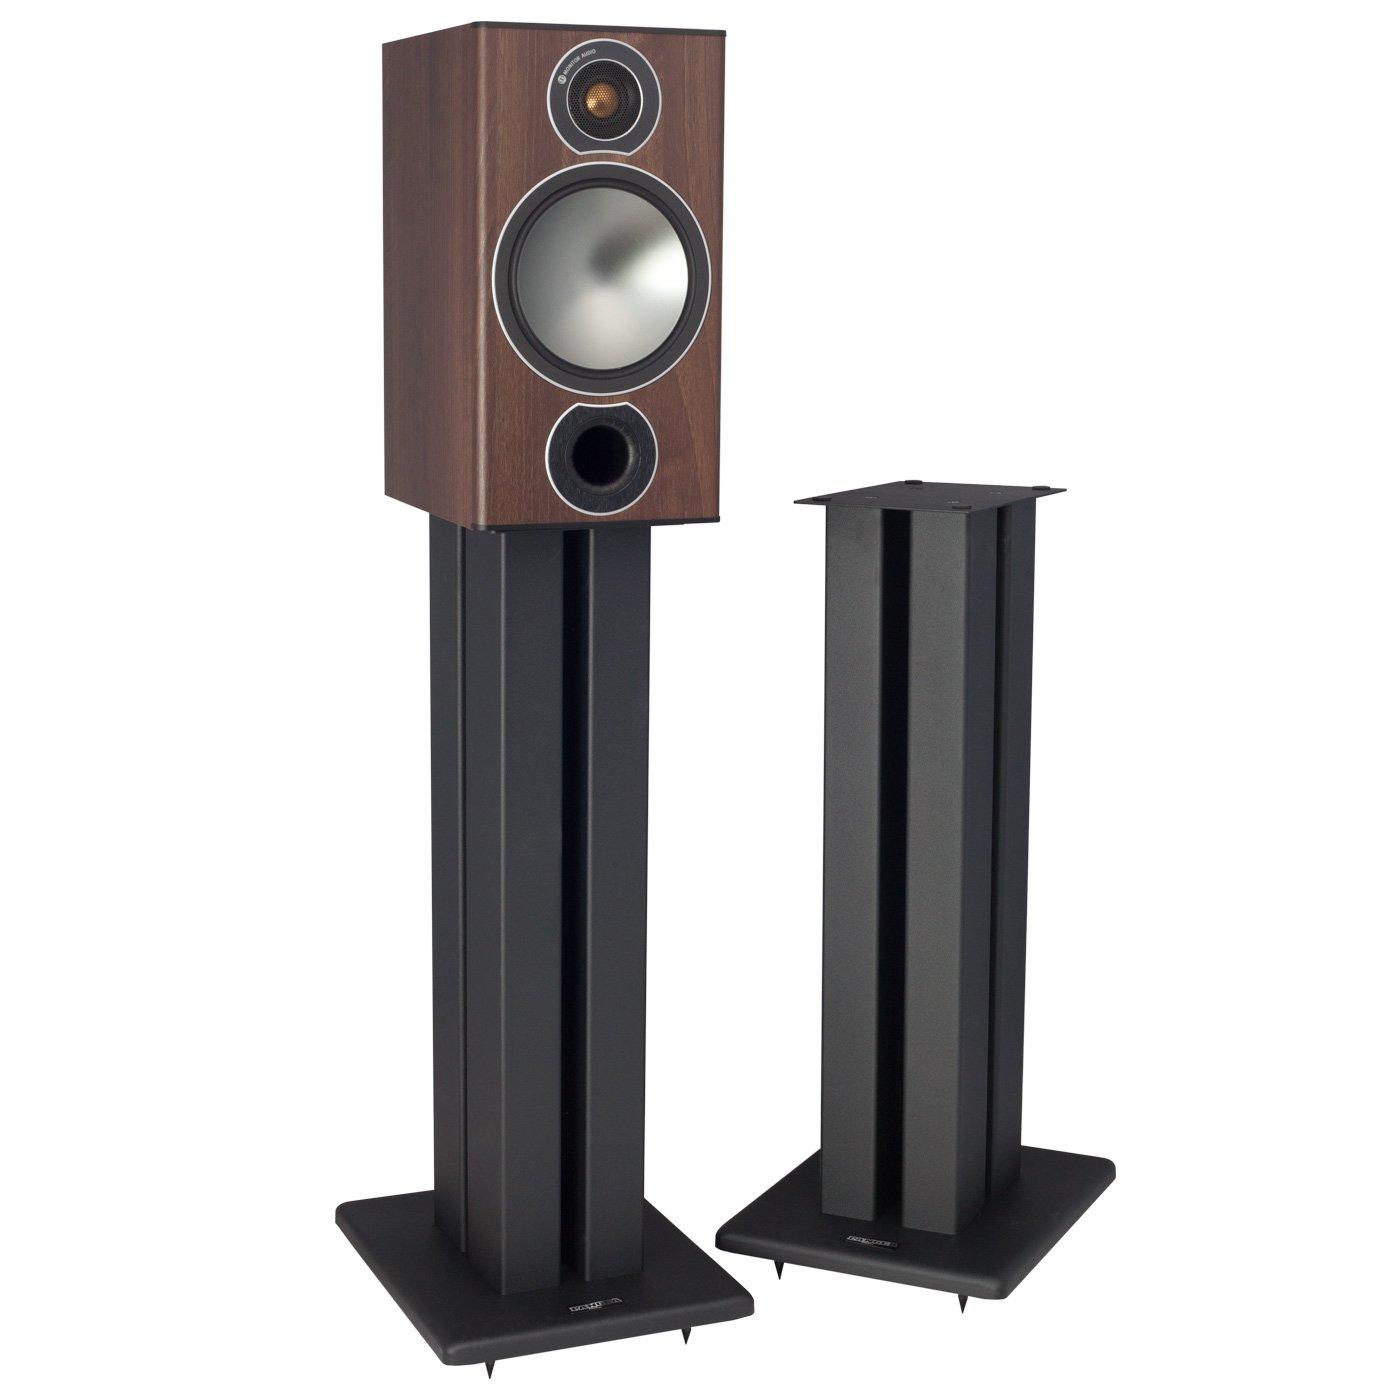 Pangea Audio DS400 Heavy Duty Speaker Stands (28 Inch) by Pangea Audio